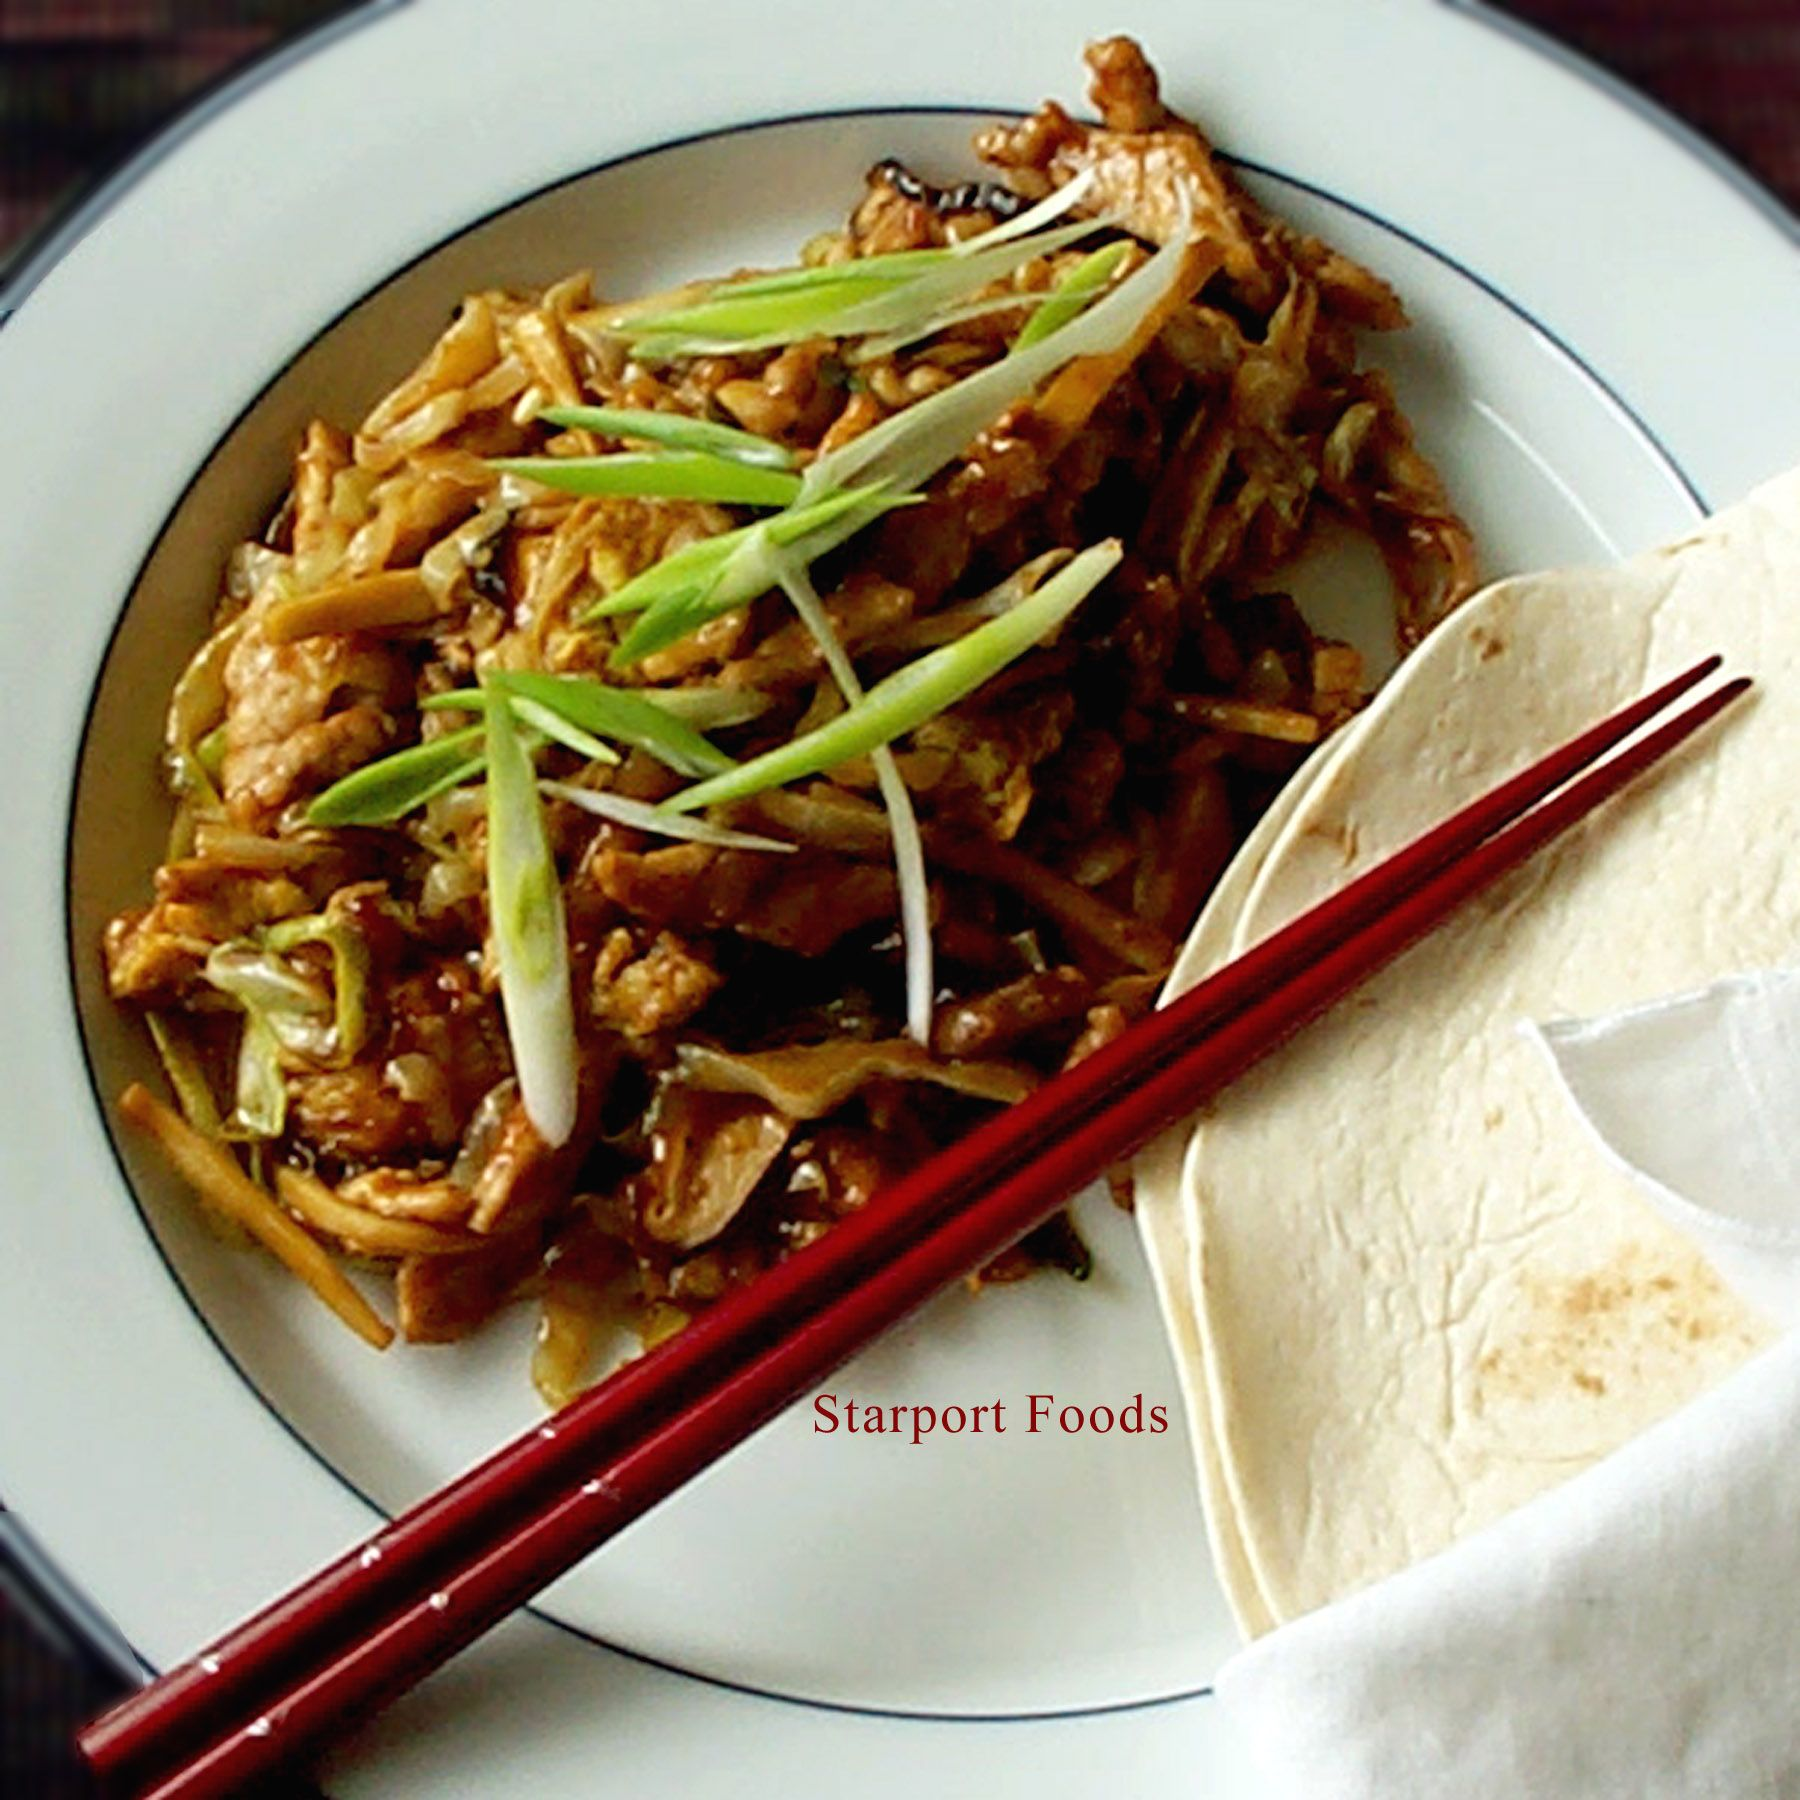 Asian recipe hoisin sauce mu shu pork asian recipes asian recipe hoisin sauce mu shu pork chinese food forumfinder Gallery